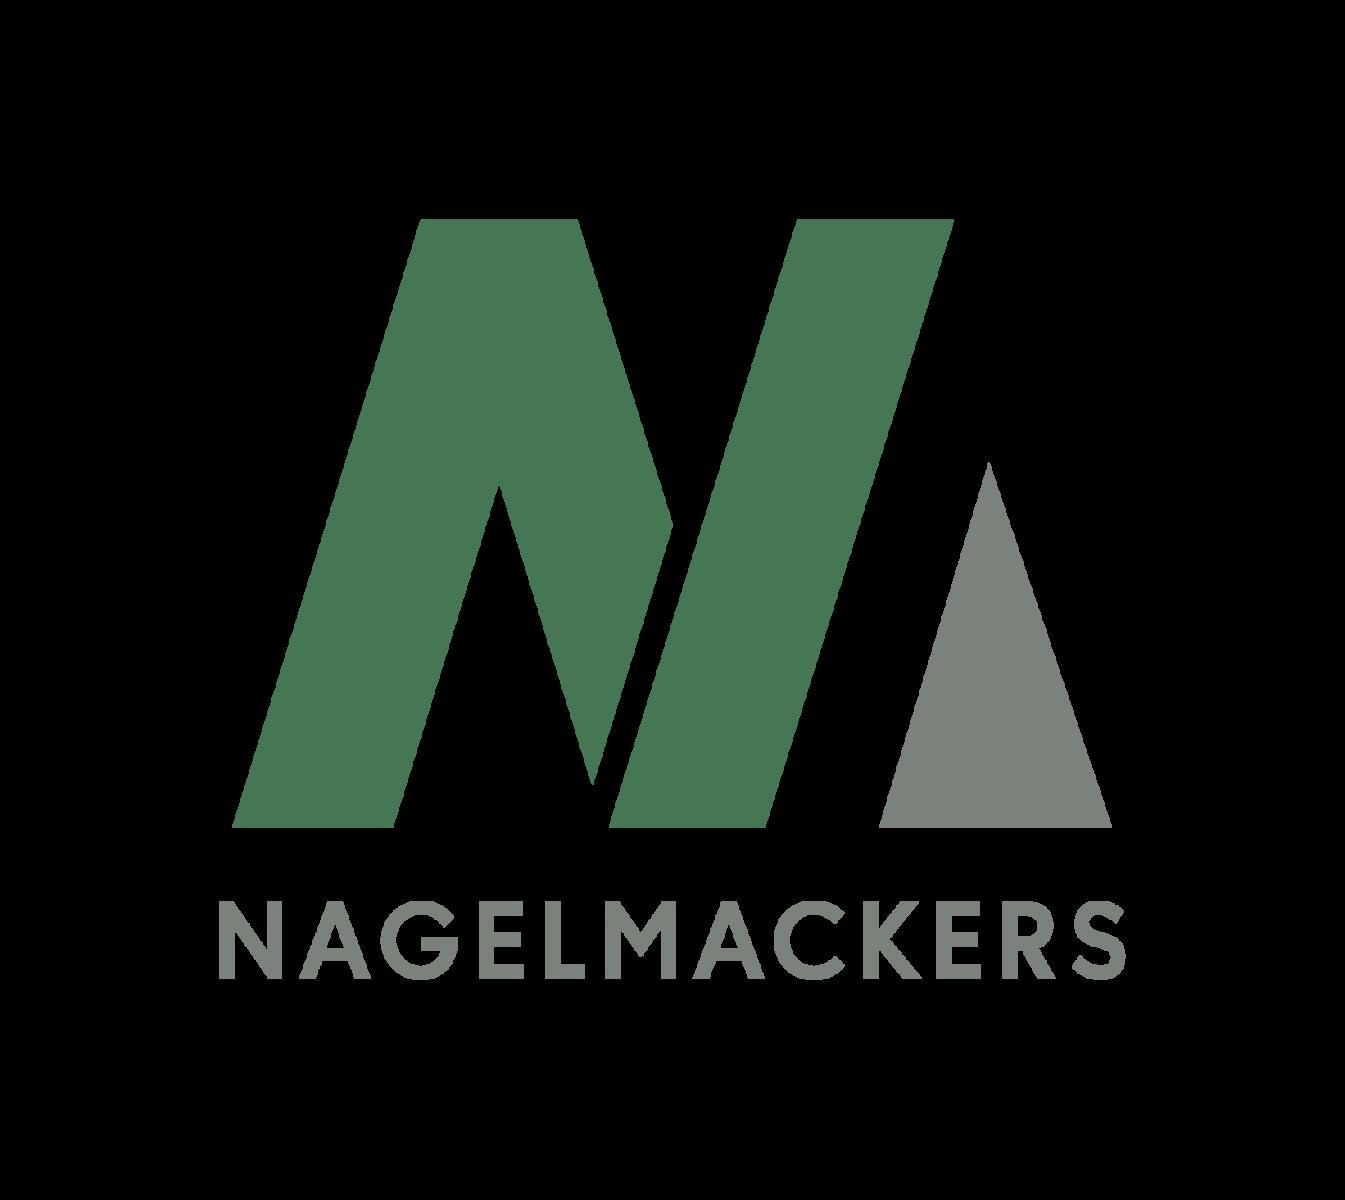 Nagelmackers logo vert Q 01